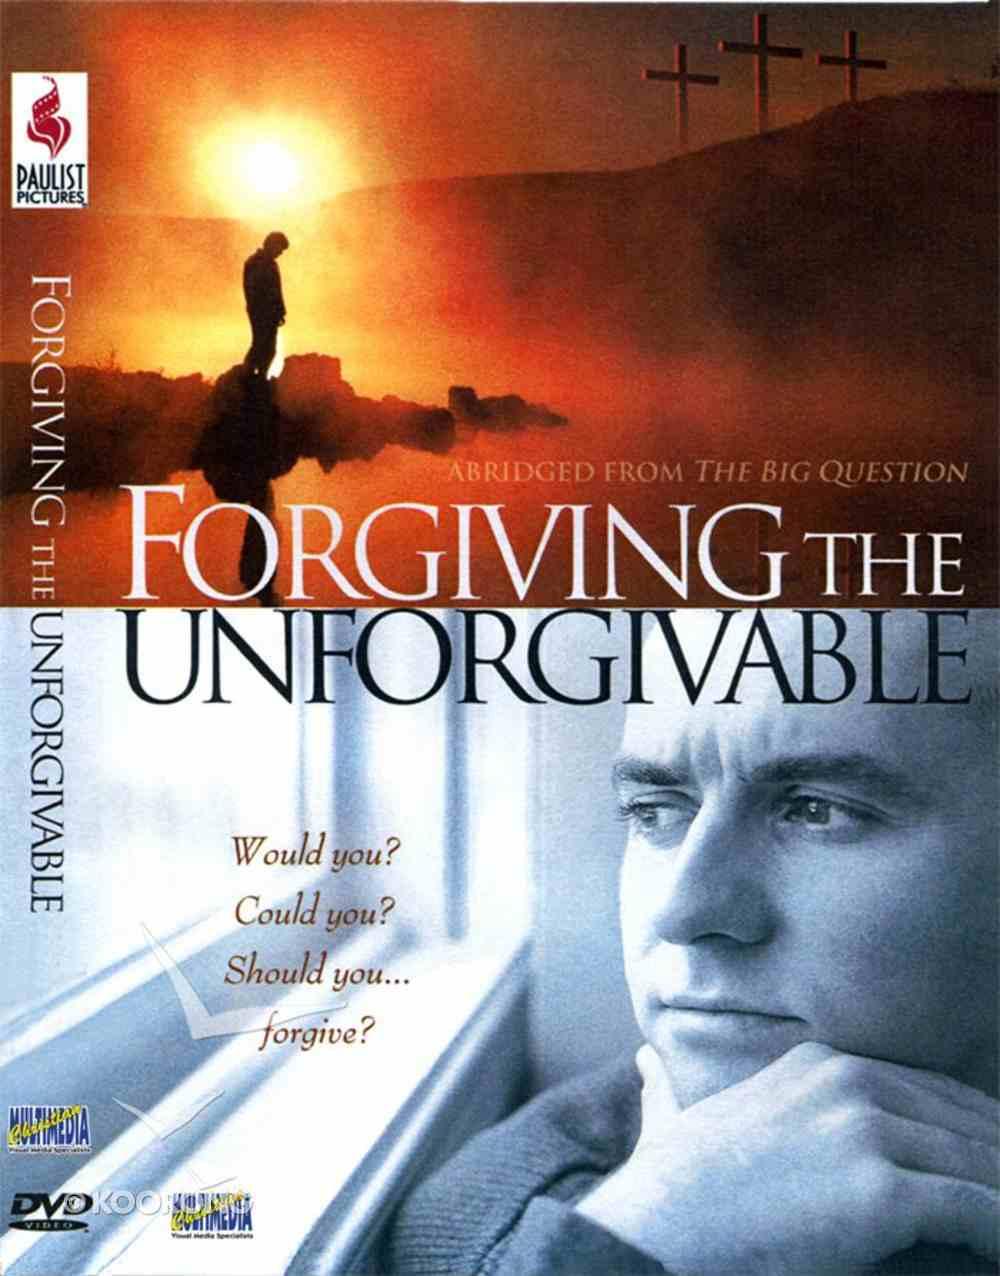 Forgiving the Unforgivable DVD